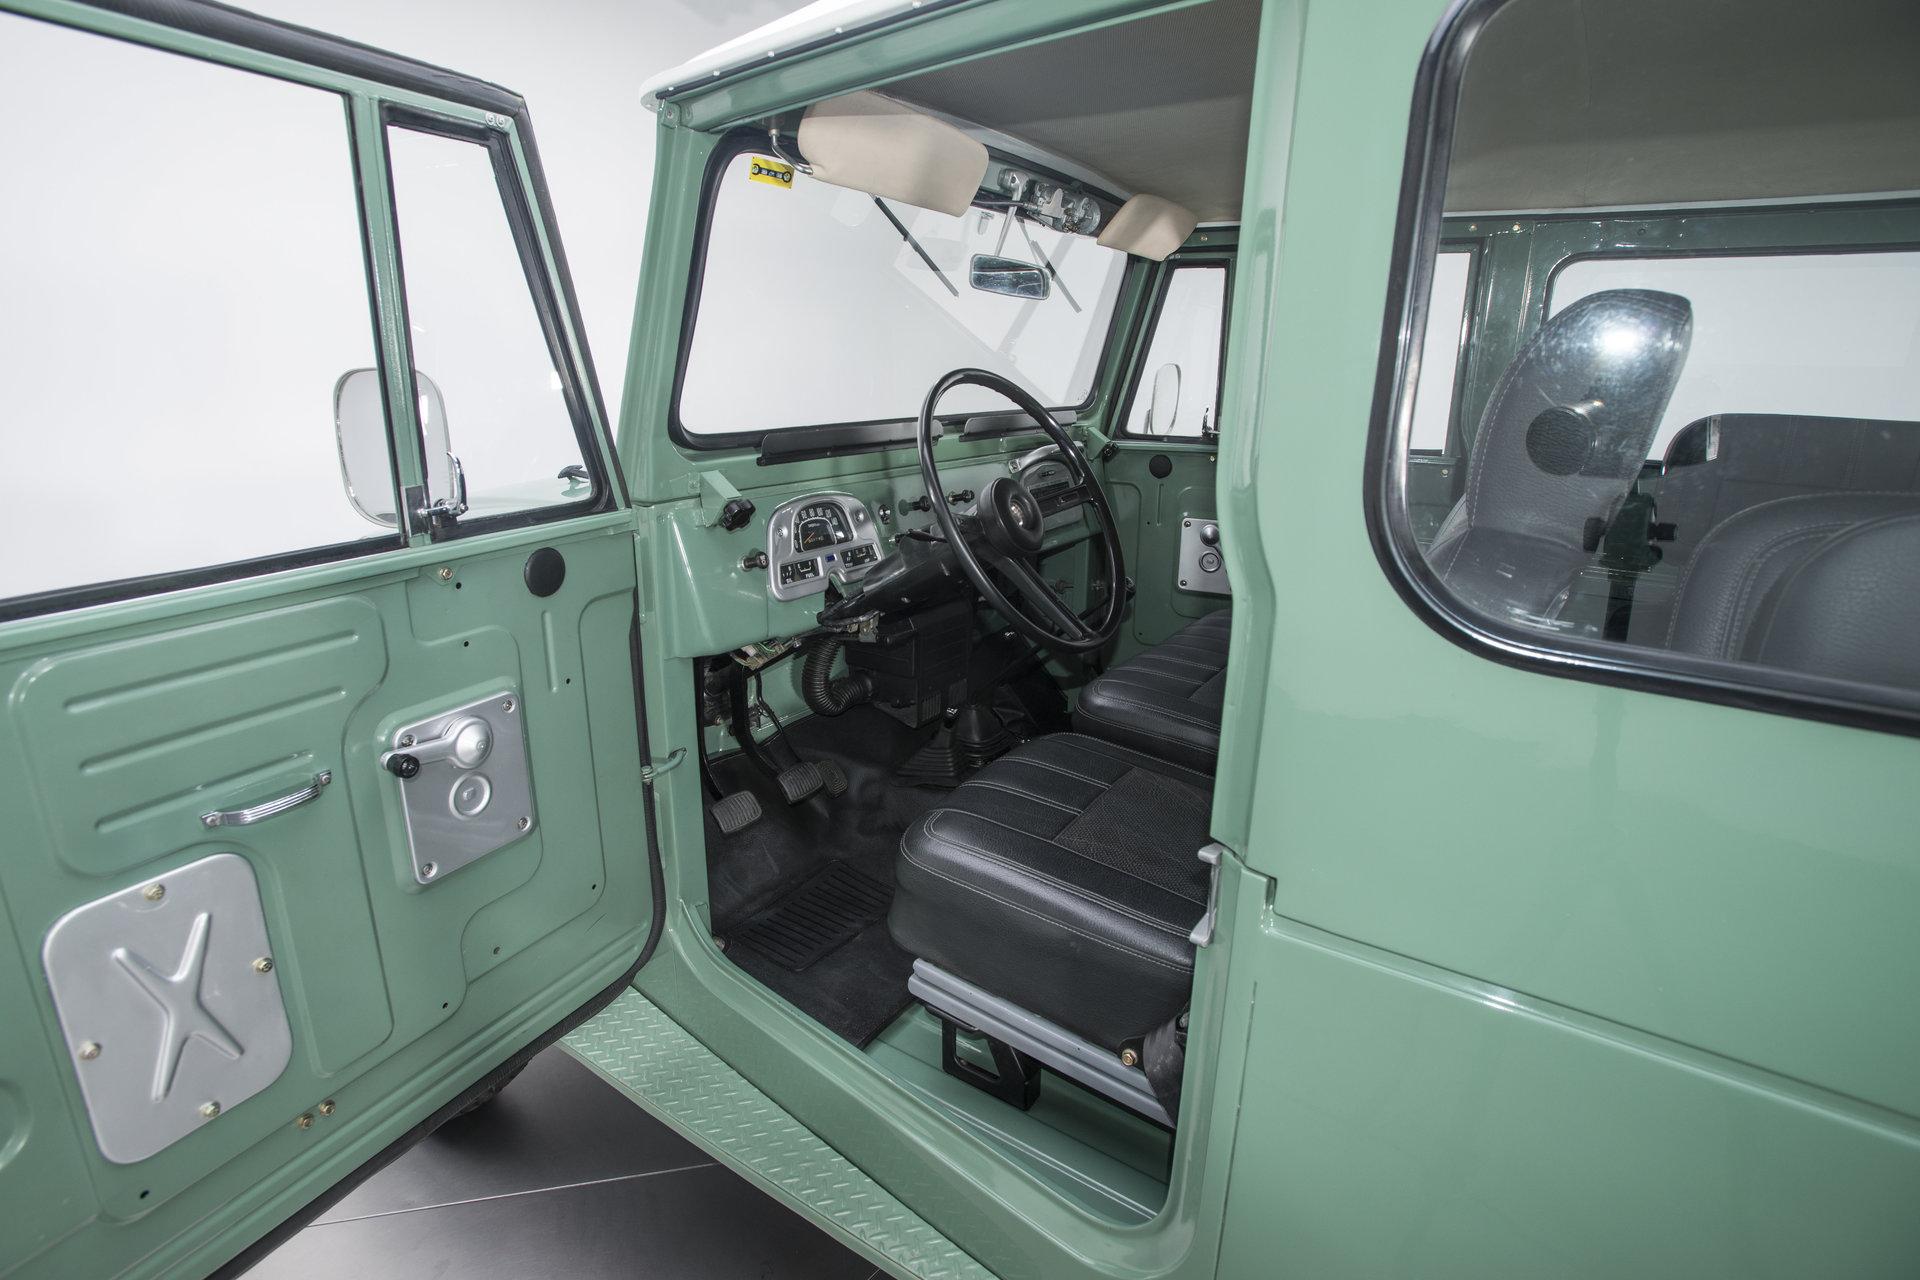 1973 Toyota Land Cruiser Fj40 For Sale 91602 Mcg